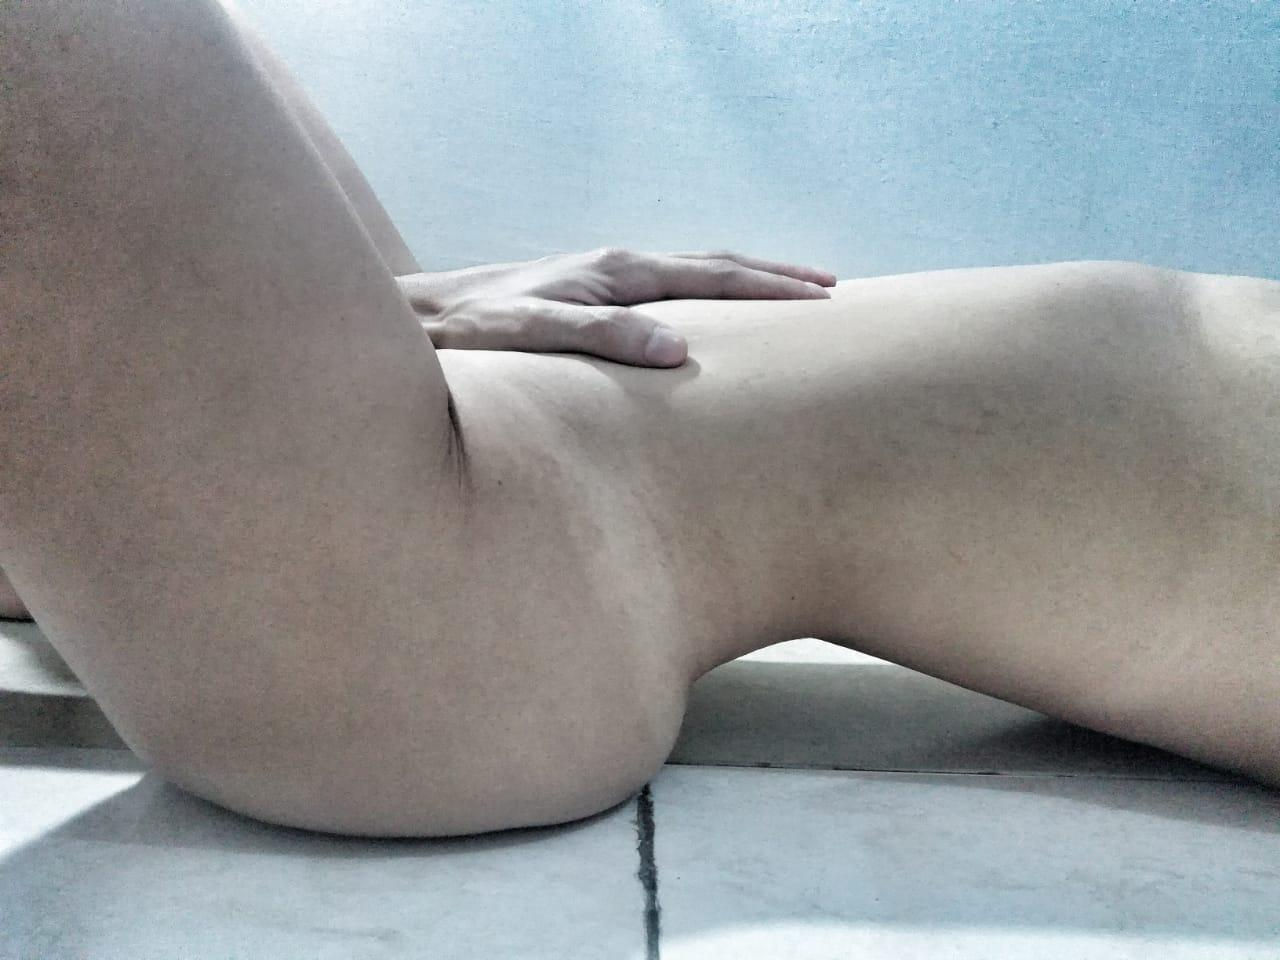 Sex horny?s=thwb6gzj7si9+6ppybpcbduejpyjqzvwehz7a4q806a=